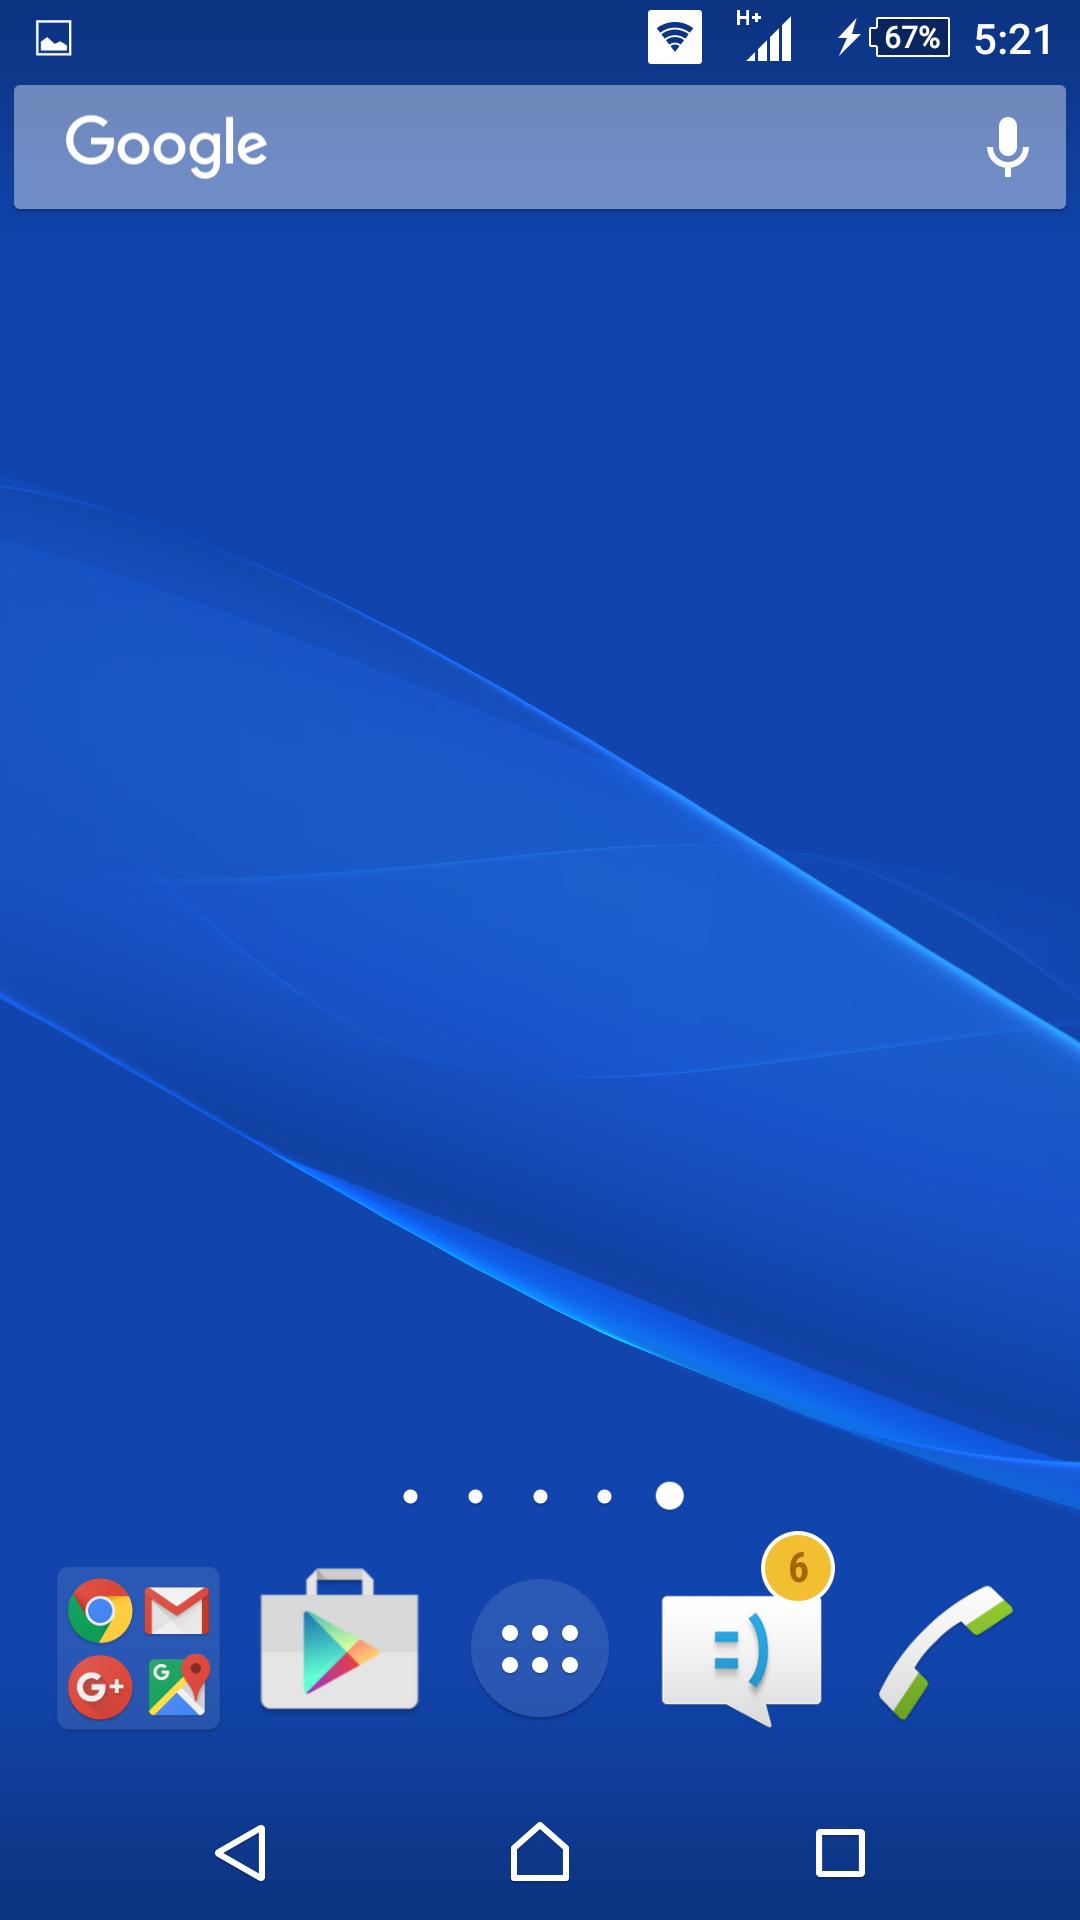 v3dw_screenshot_2016-03-18-17-21-56.png